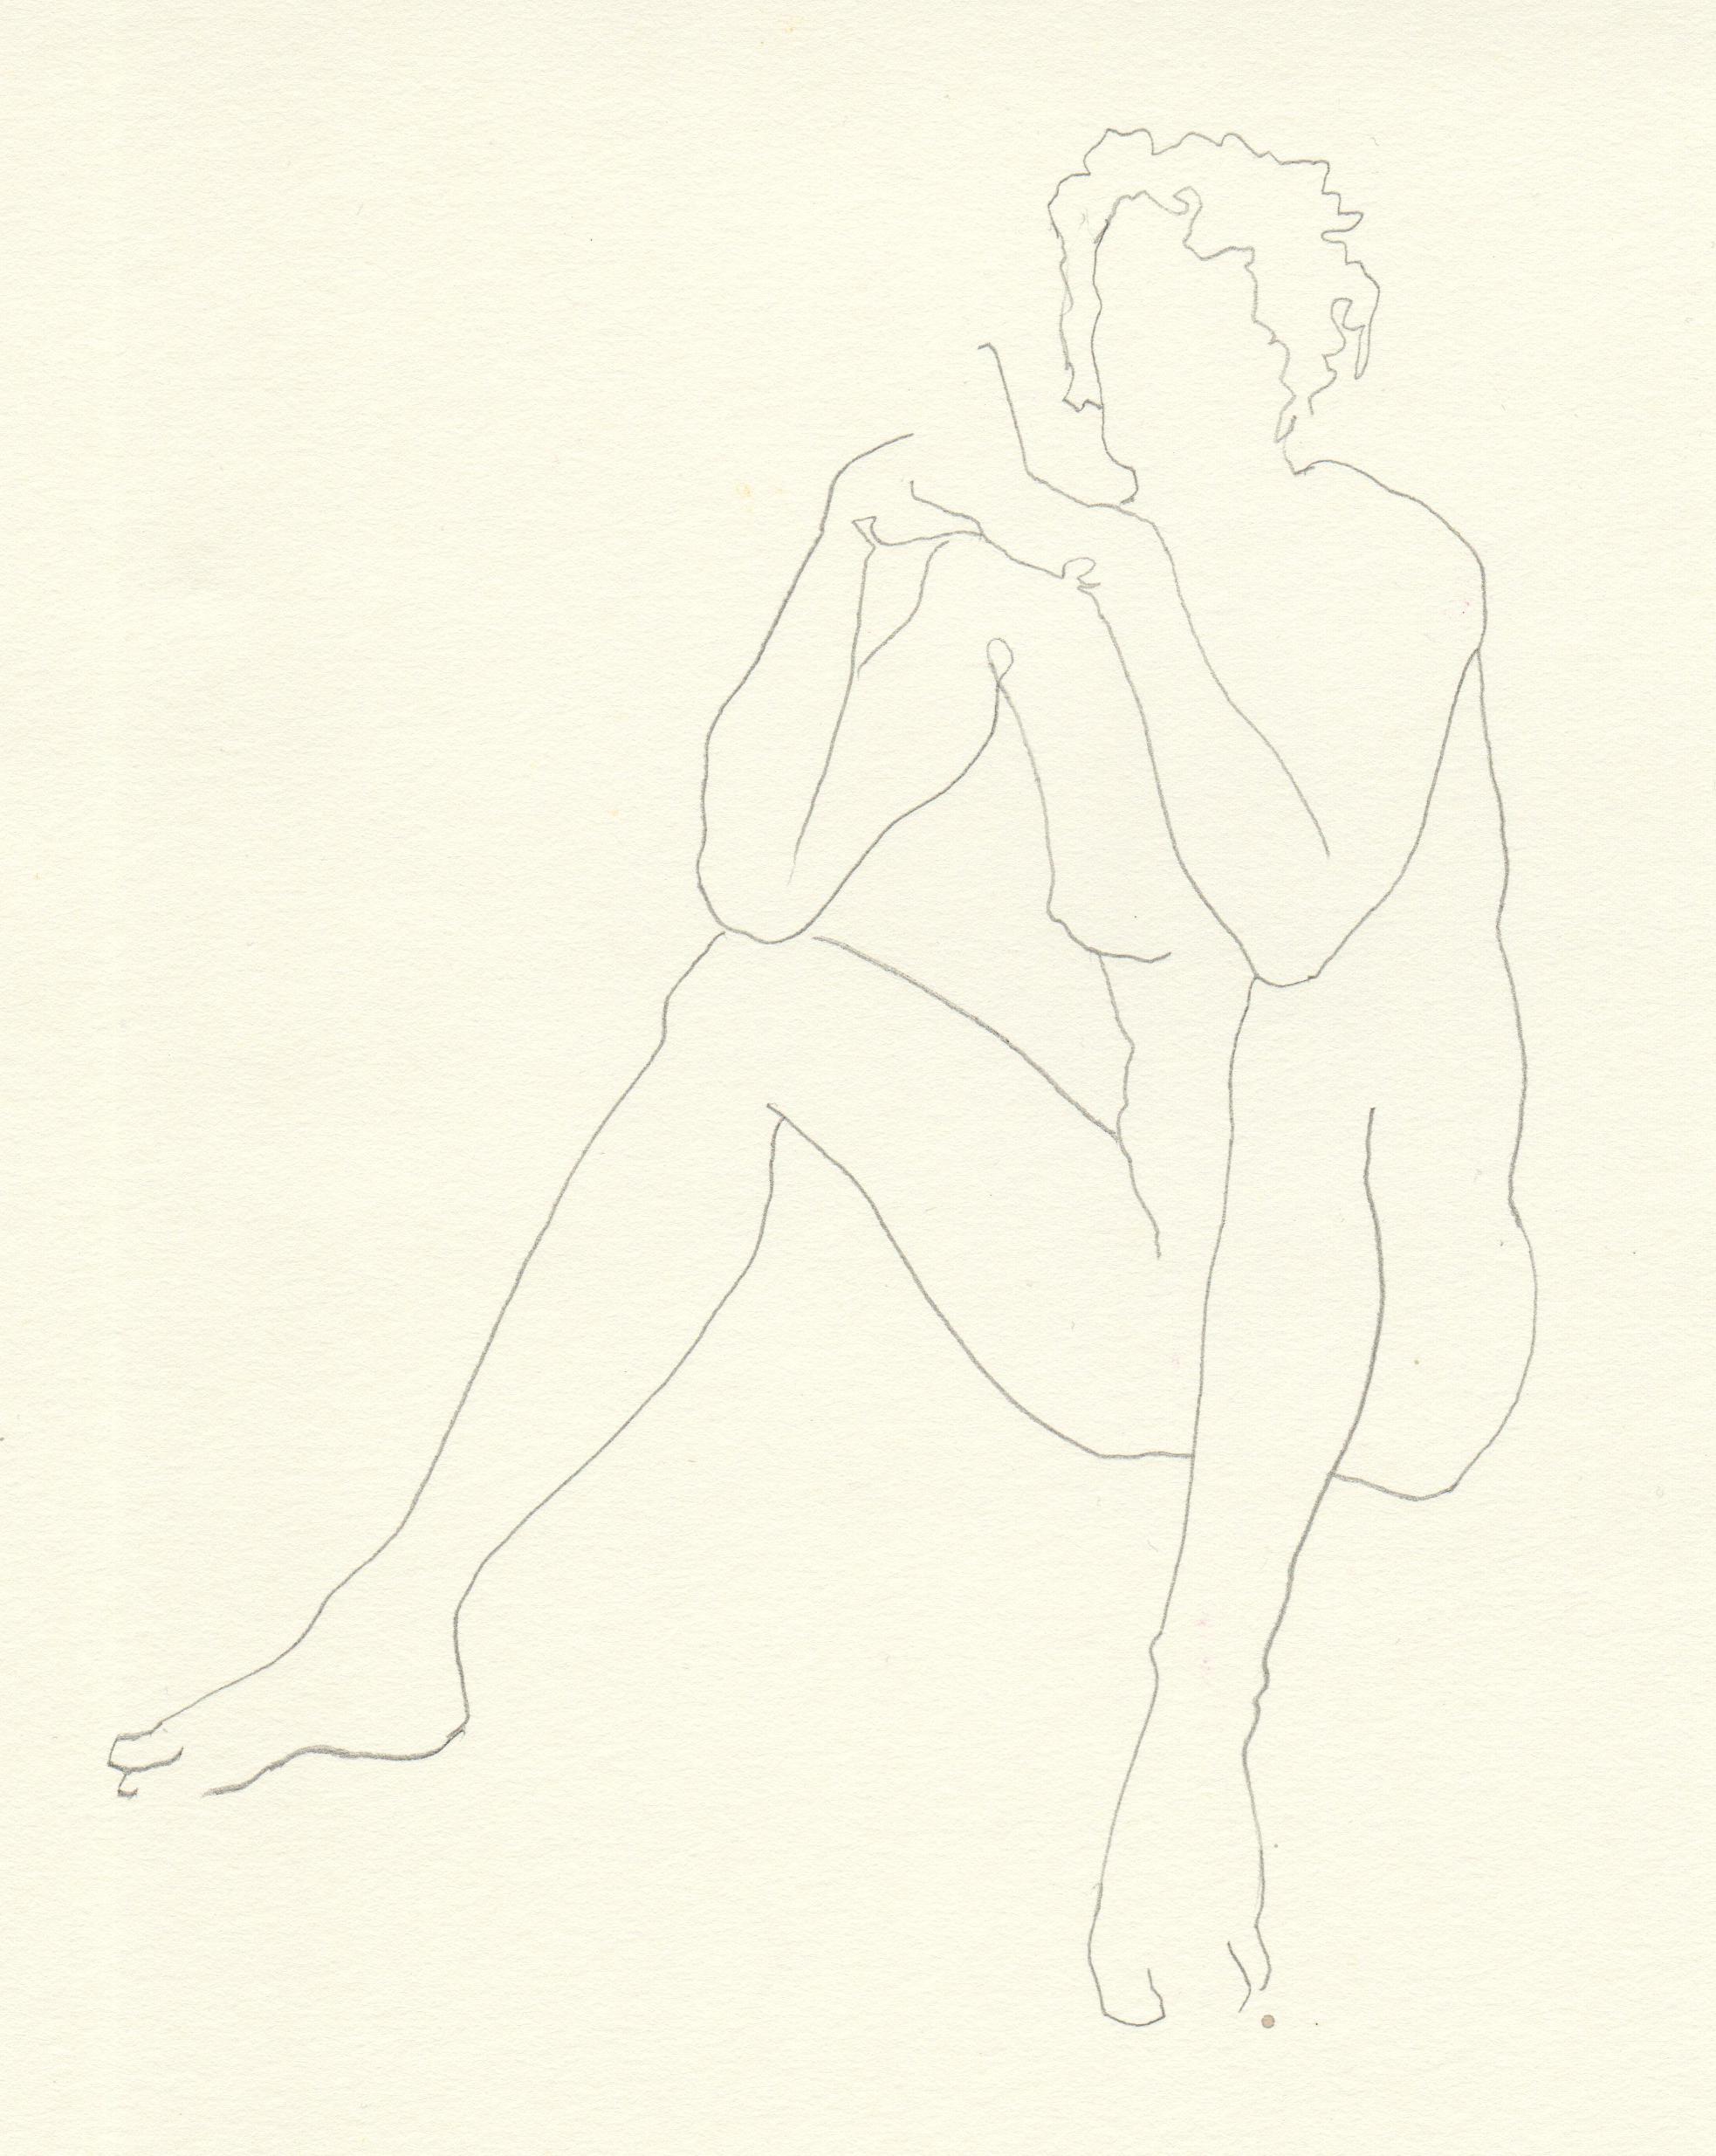 2012_Sketch_F-Beudin_038